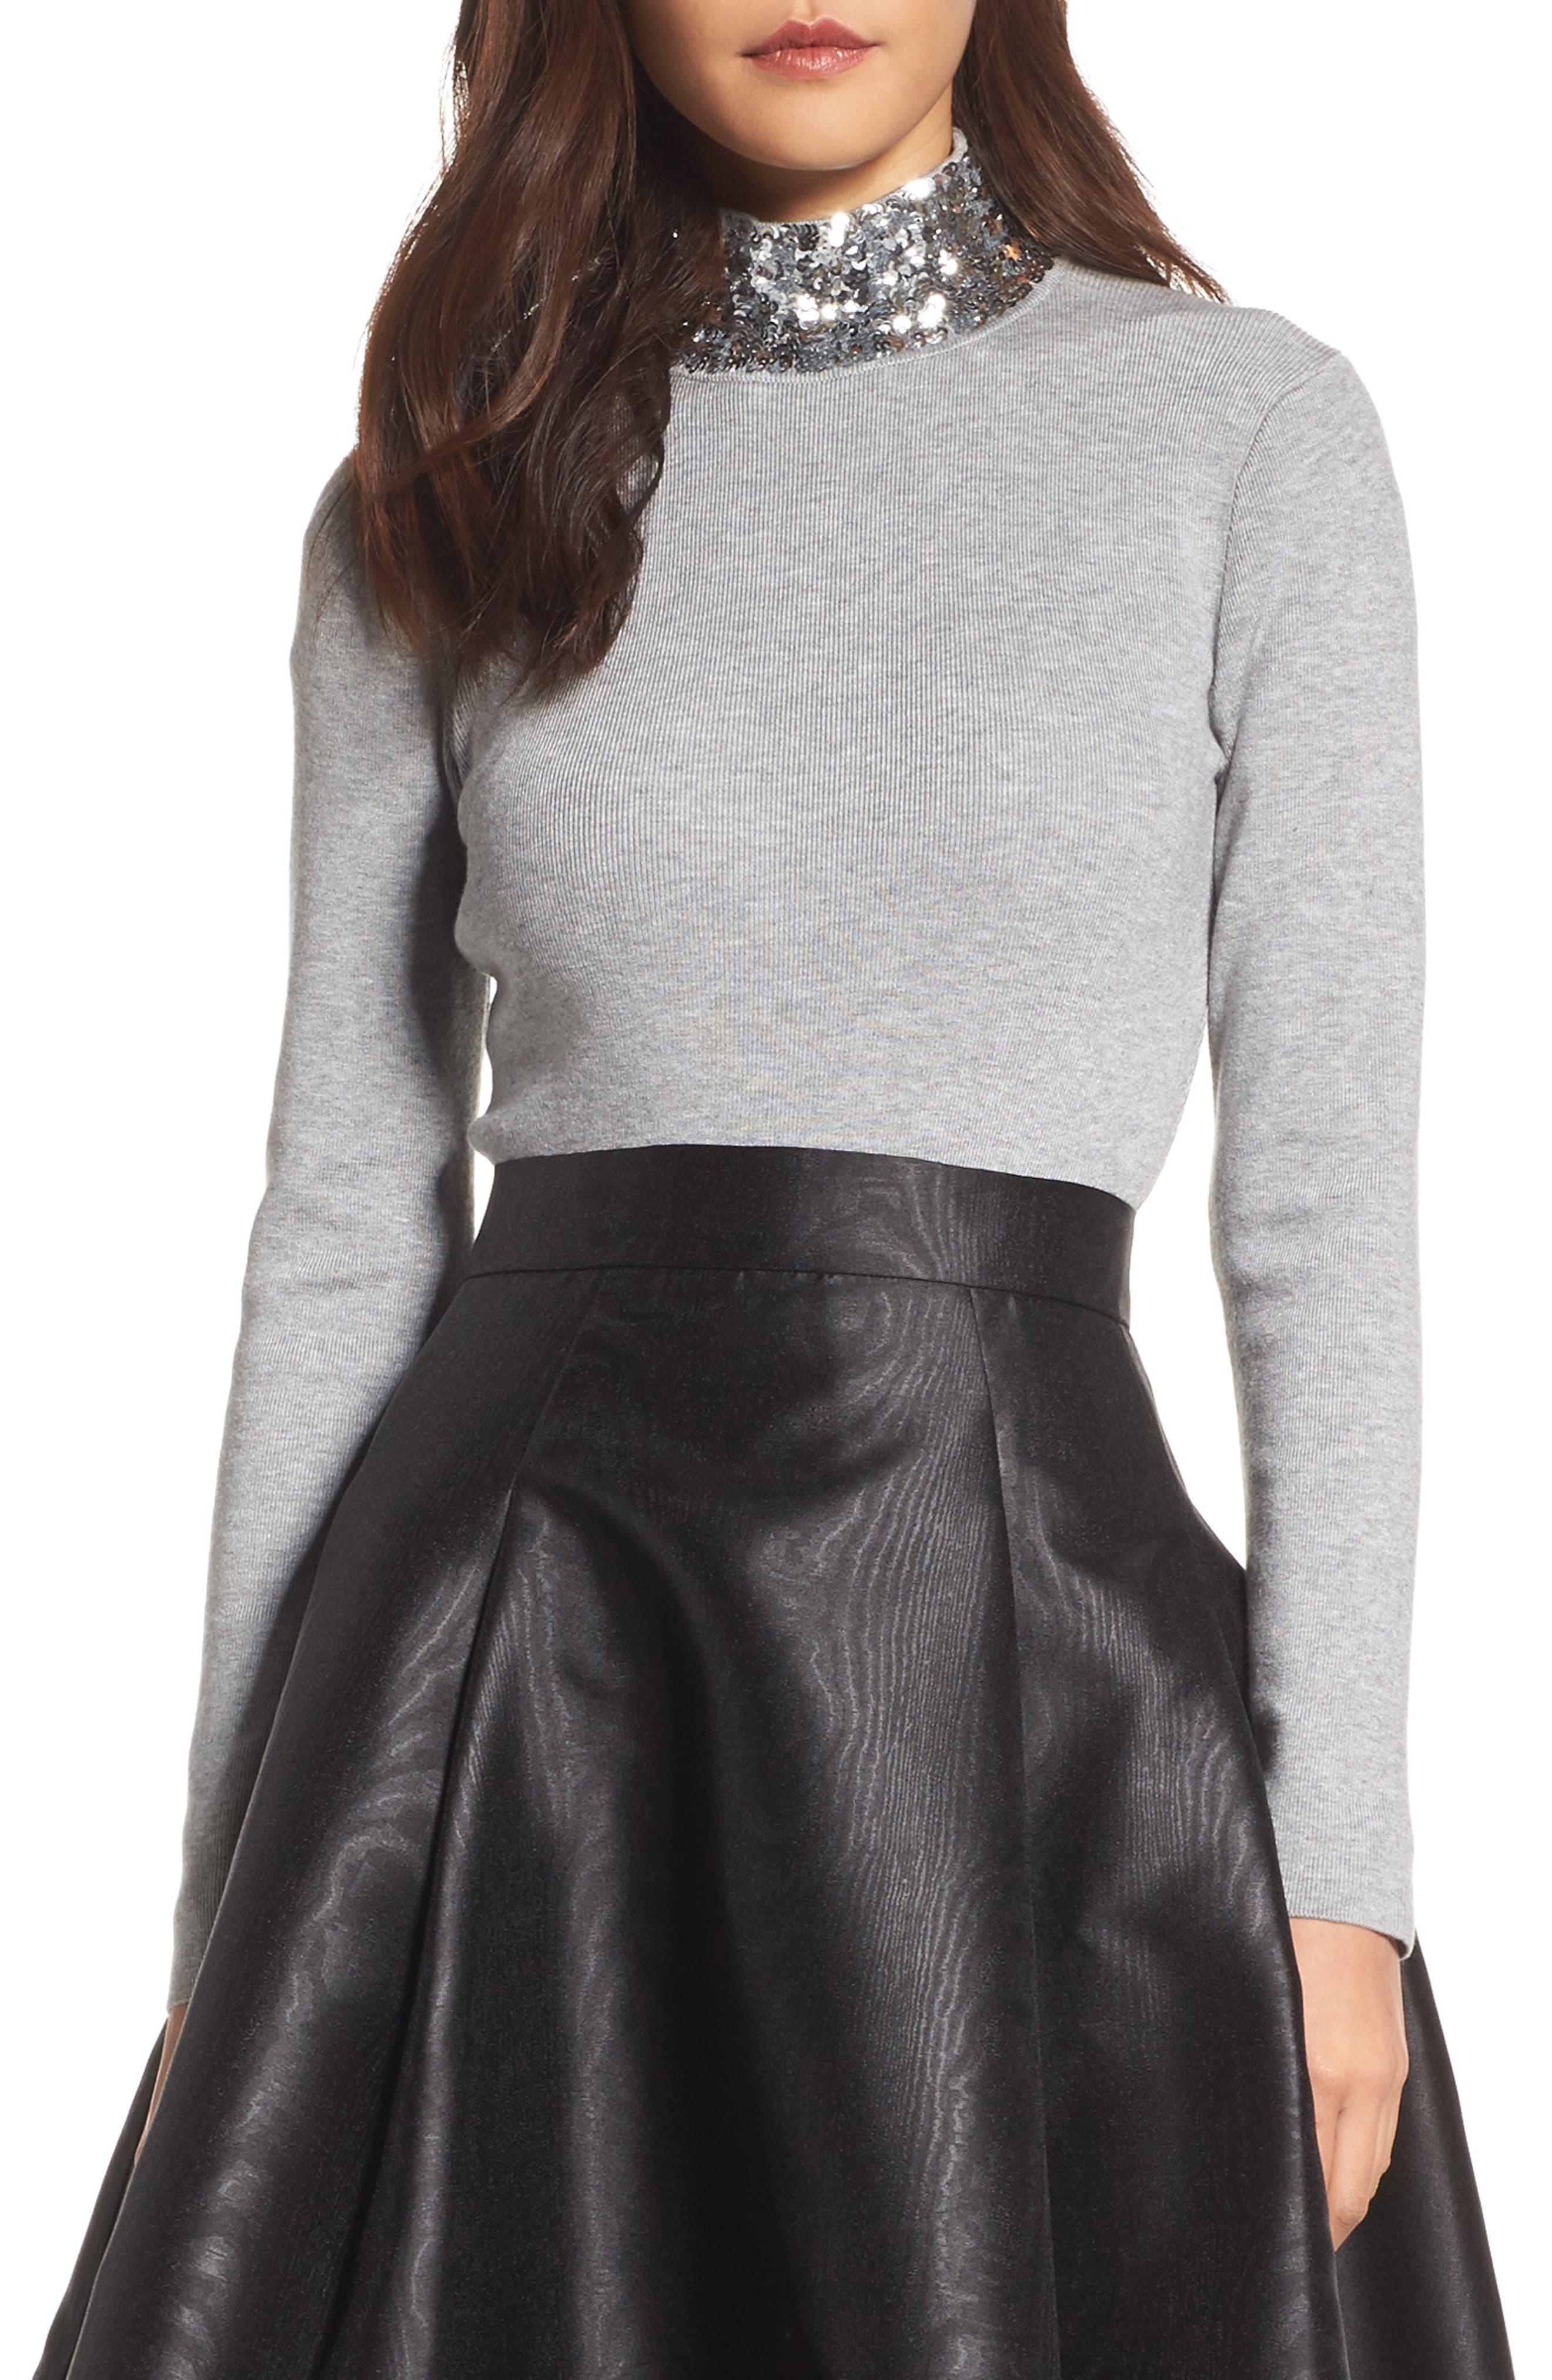 Sequin Mock Neck Sweater,                         Main,                         color, 030